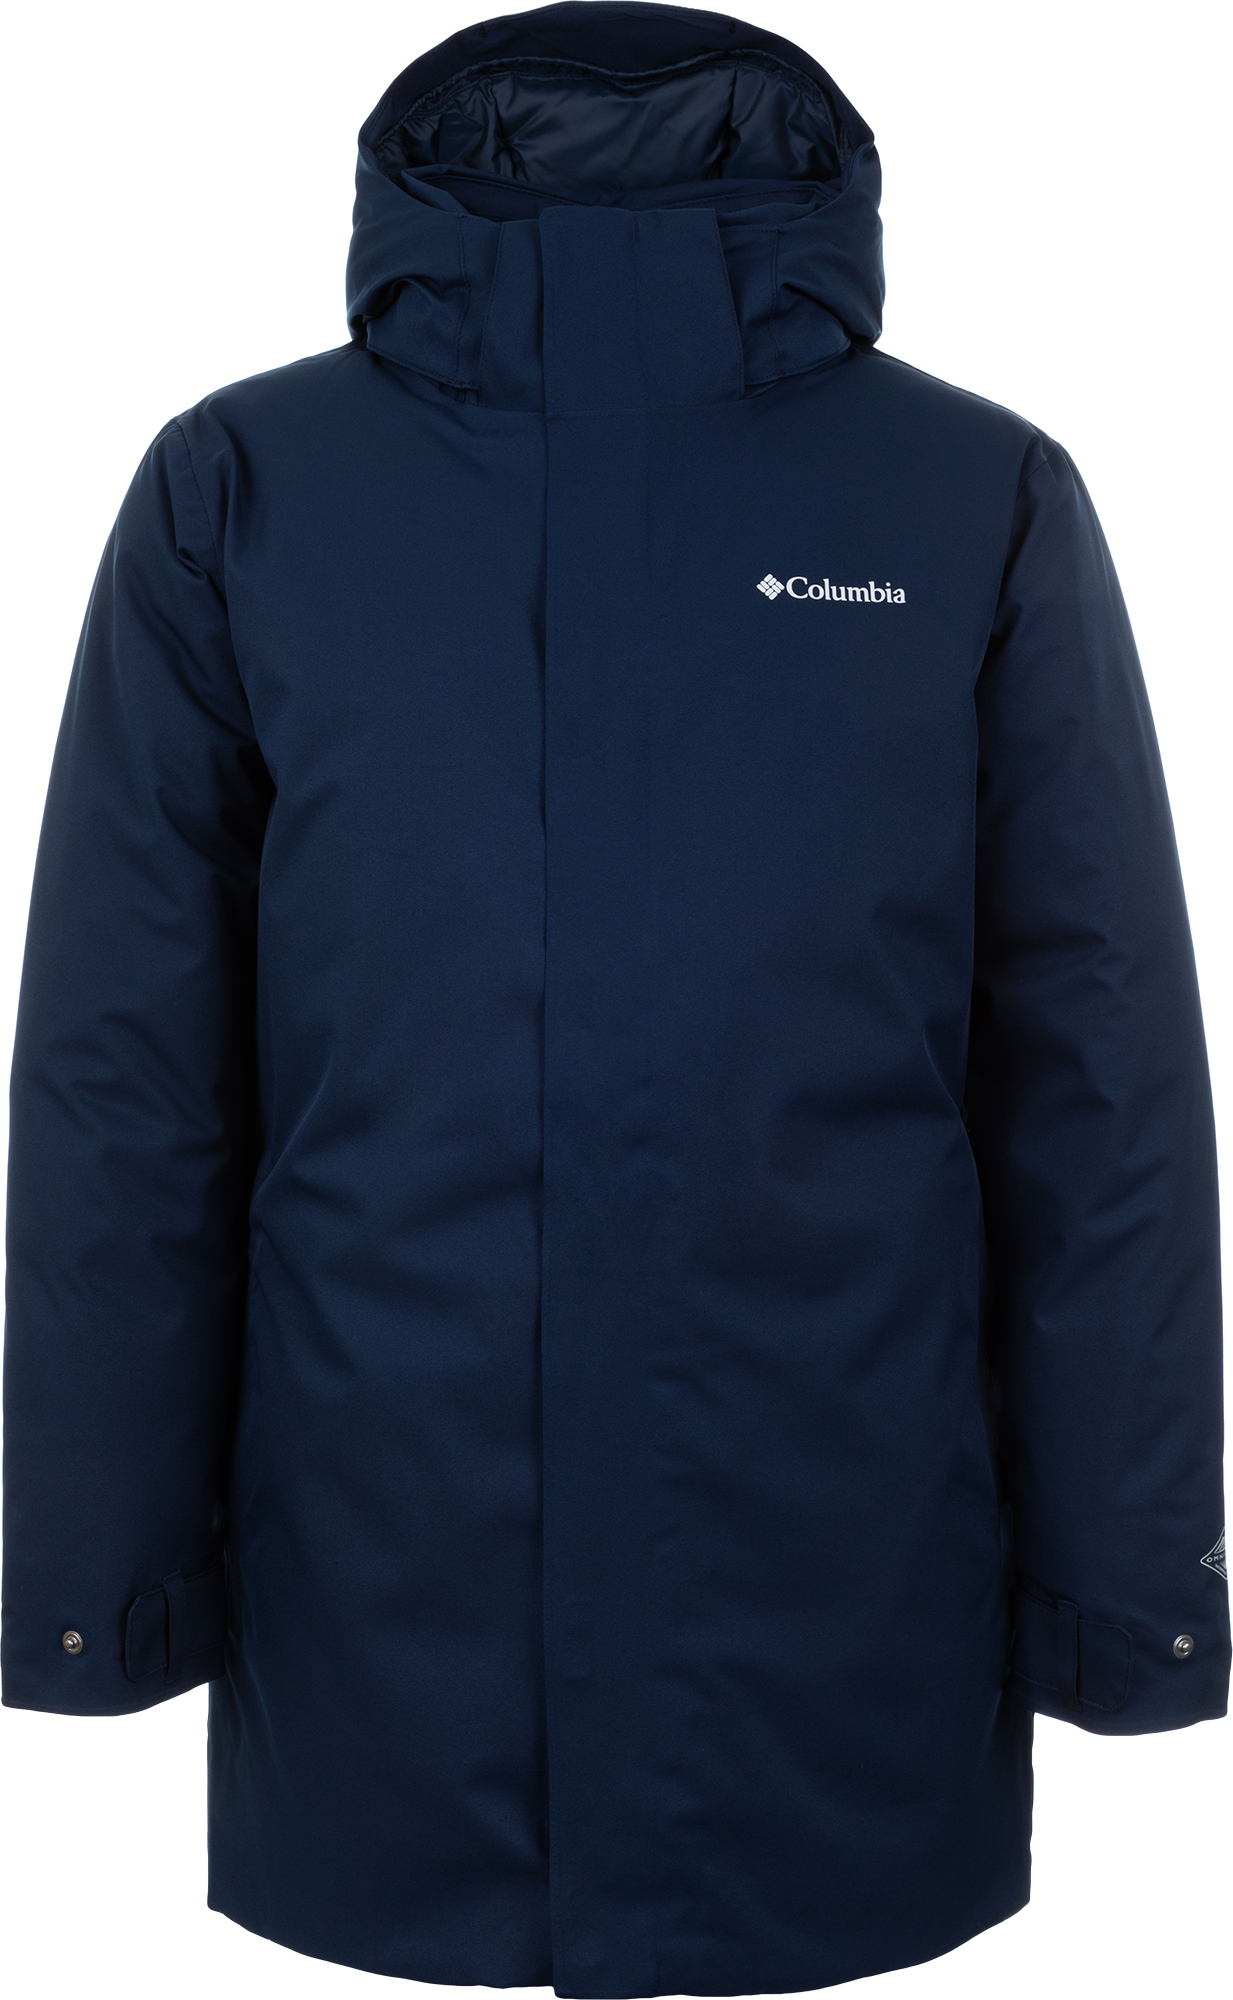 Columbia Куртка утепленная мужская Columbia Blizzard Fighter, размер 56-58 цены